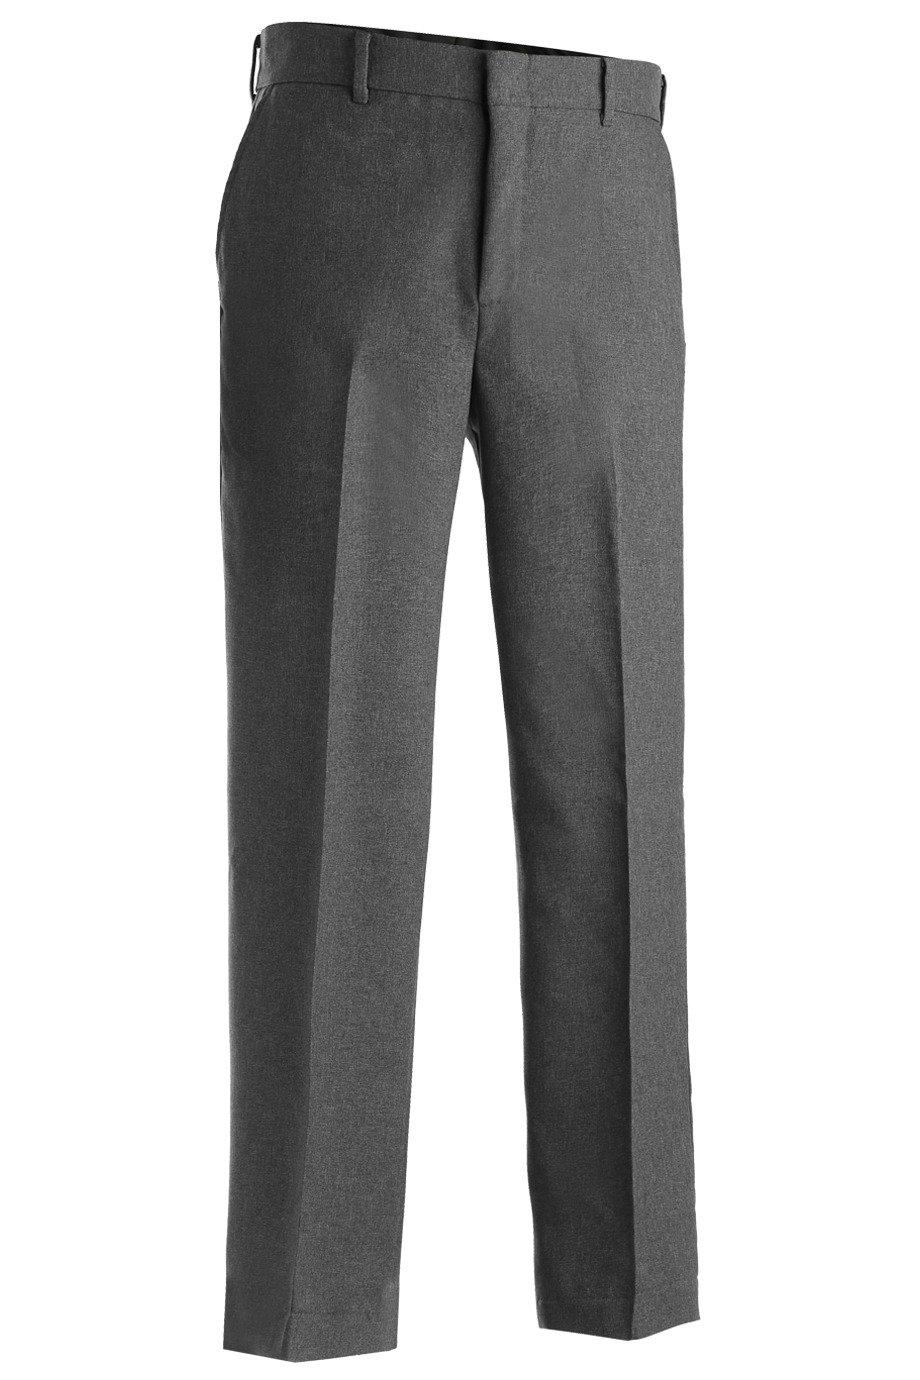 Edwards Garment PANTS メンズ B00YPNXWBW 50W x 29L|ヘザーグレー ヘザーグレー 50W x 29L